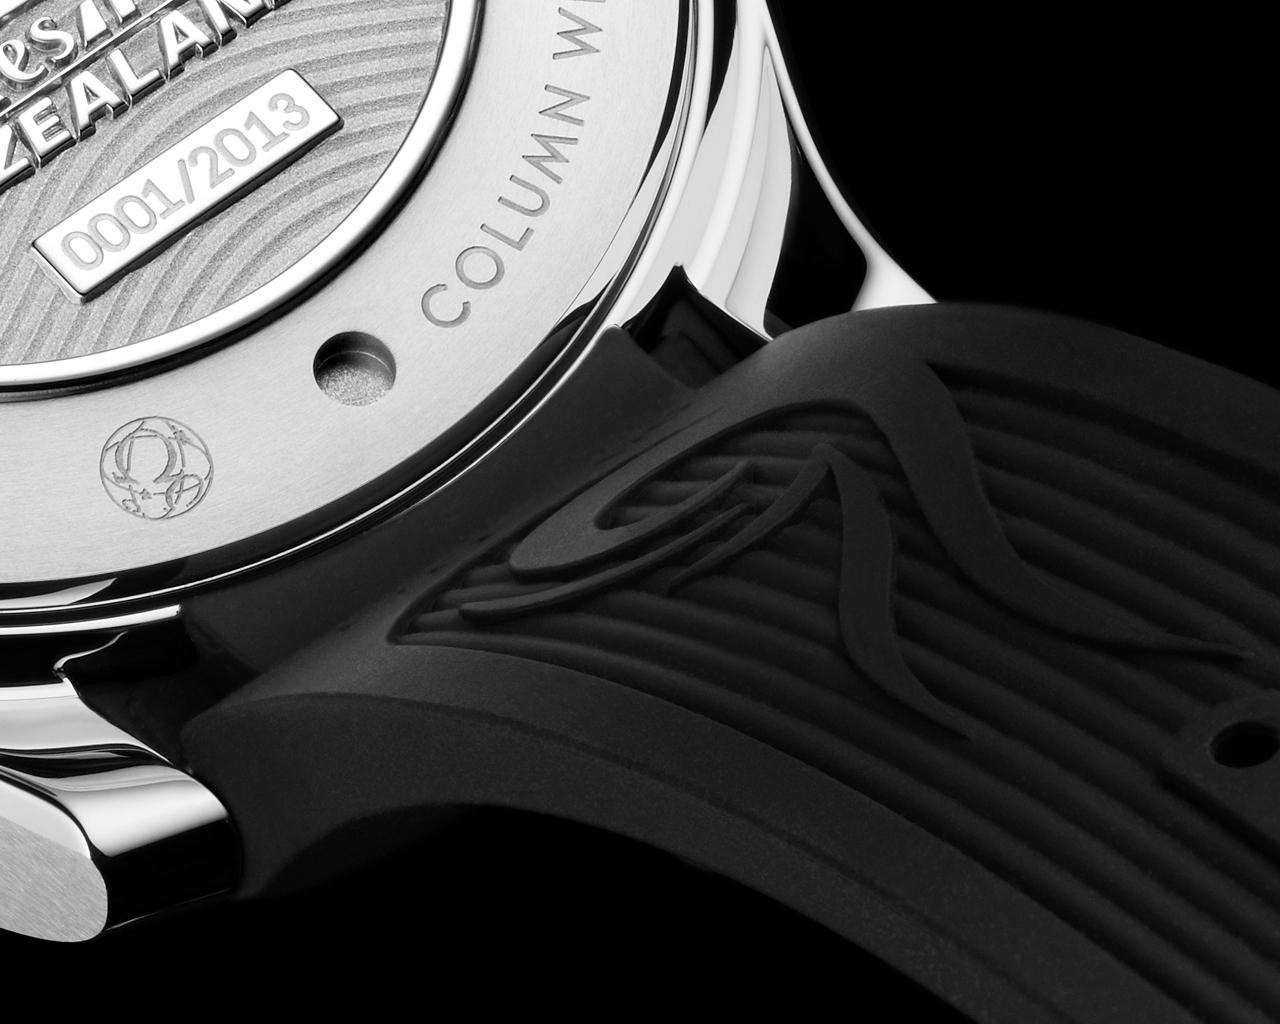 omega-seamaster-diver-etnz-limited-edition_0-100_12